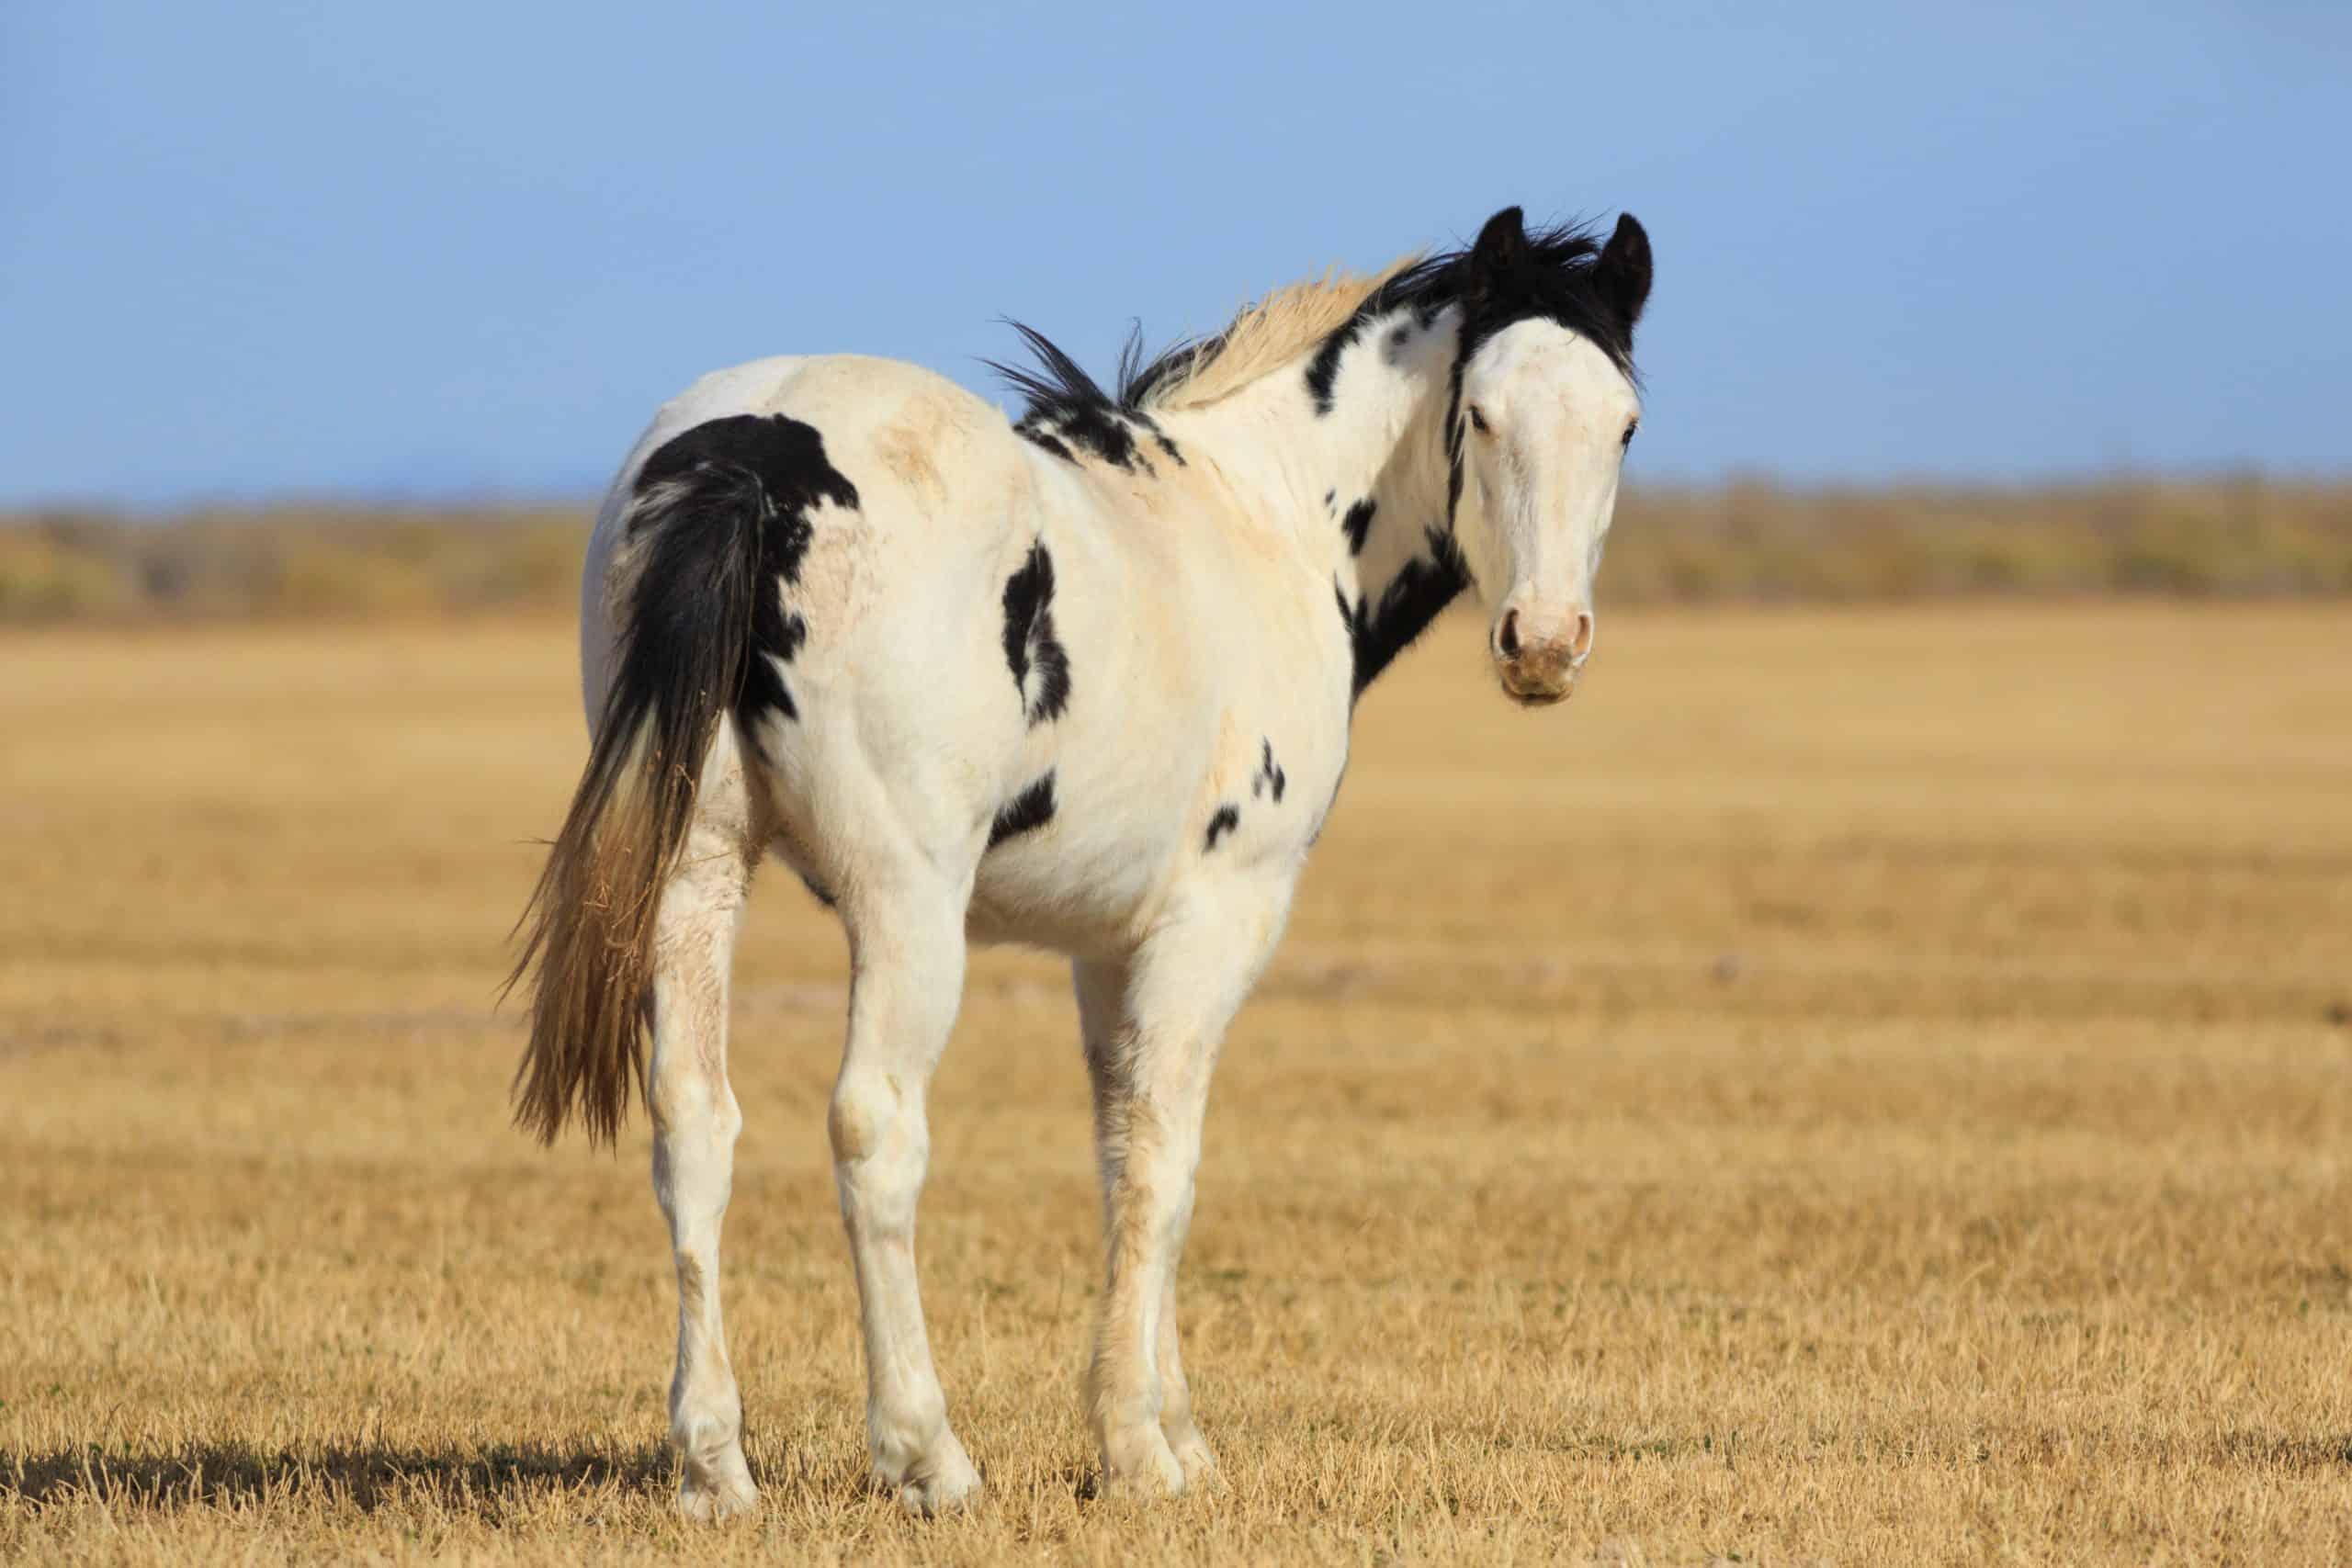 horses for adoption tips